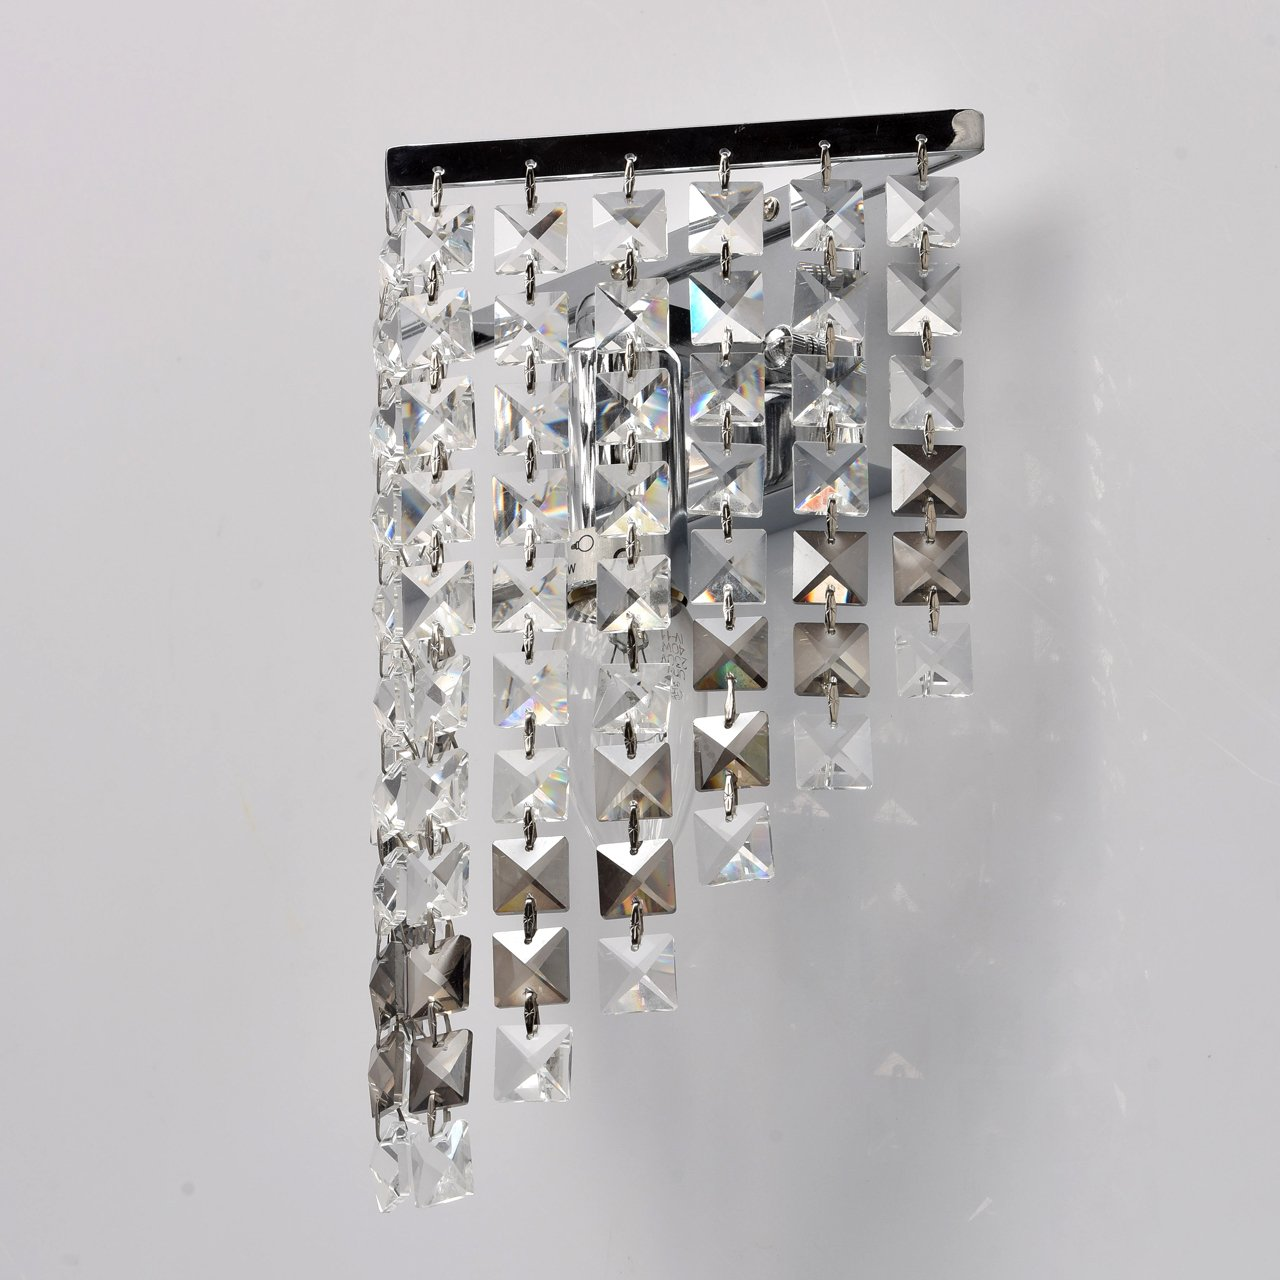 Applique moderno gocce cristalli in stile barocco contemporaneo 1 ...